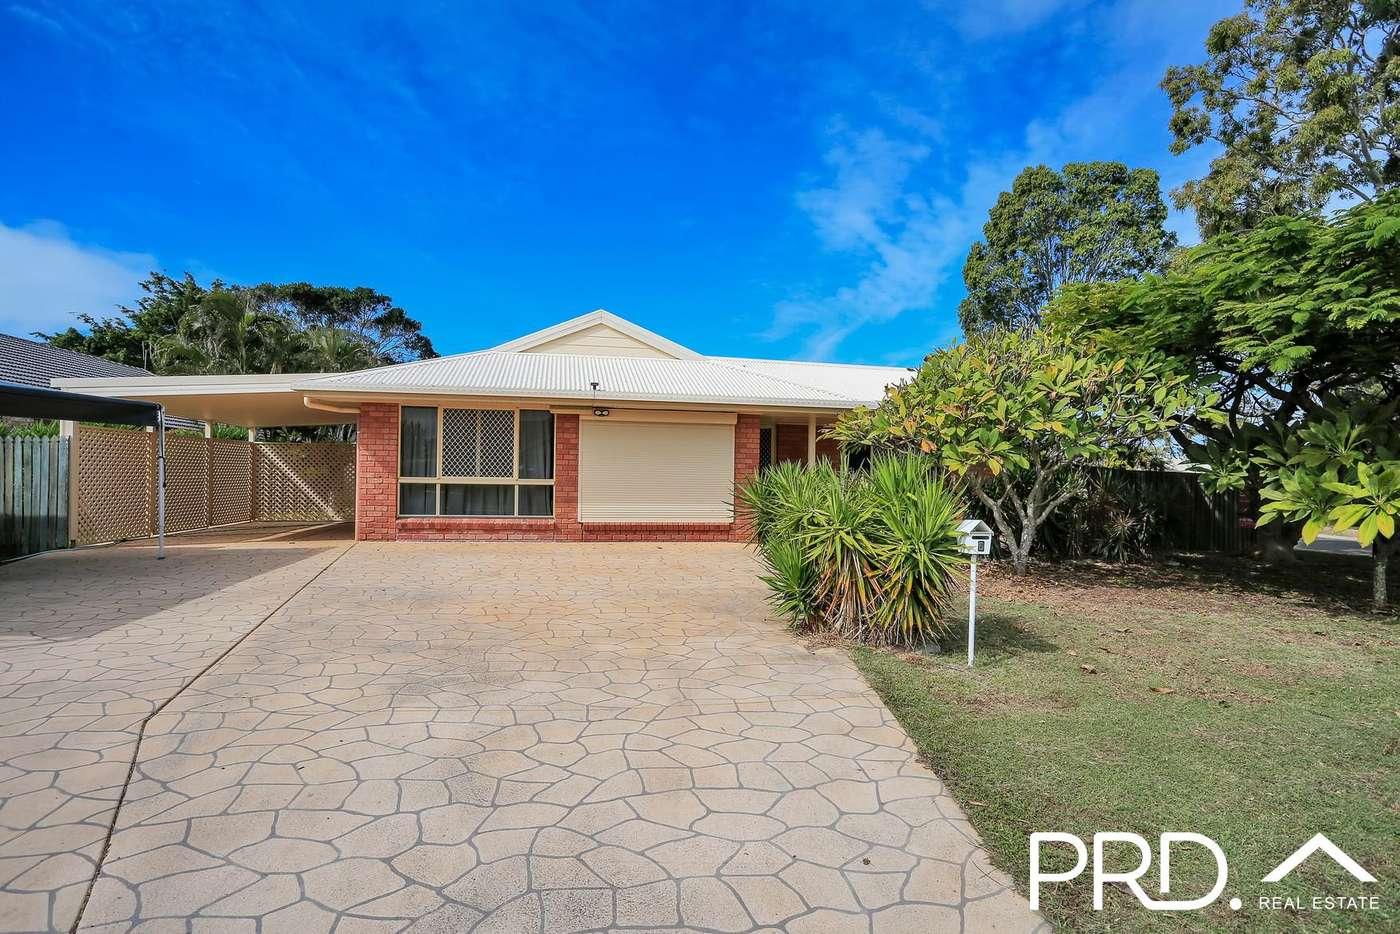 Main view of Homely house listing, 6 Shari Court, Bargara QLD 4670